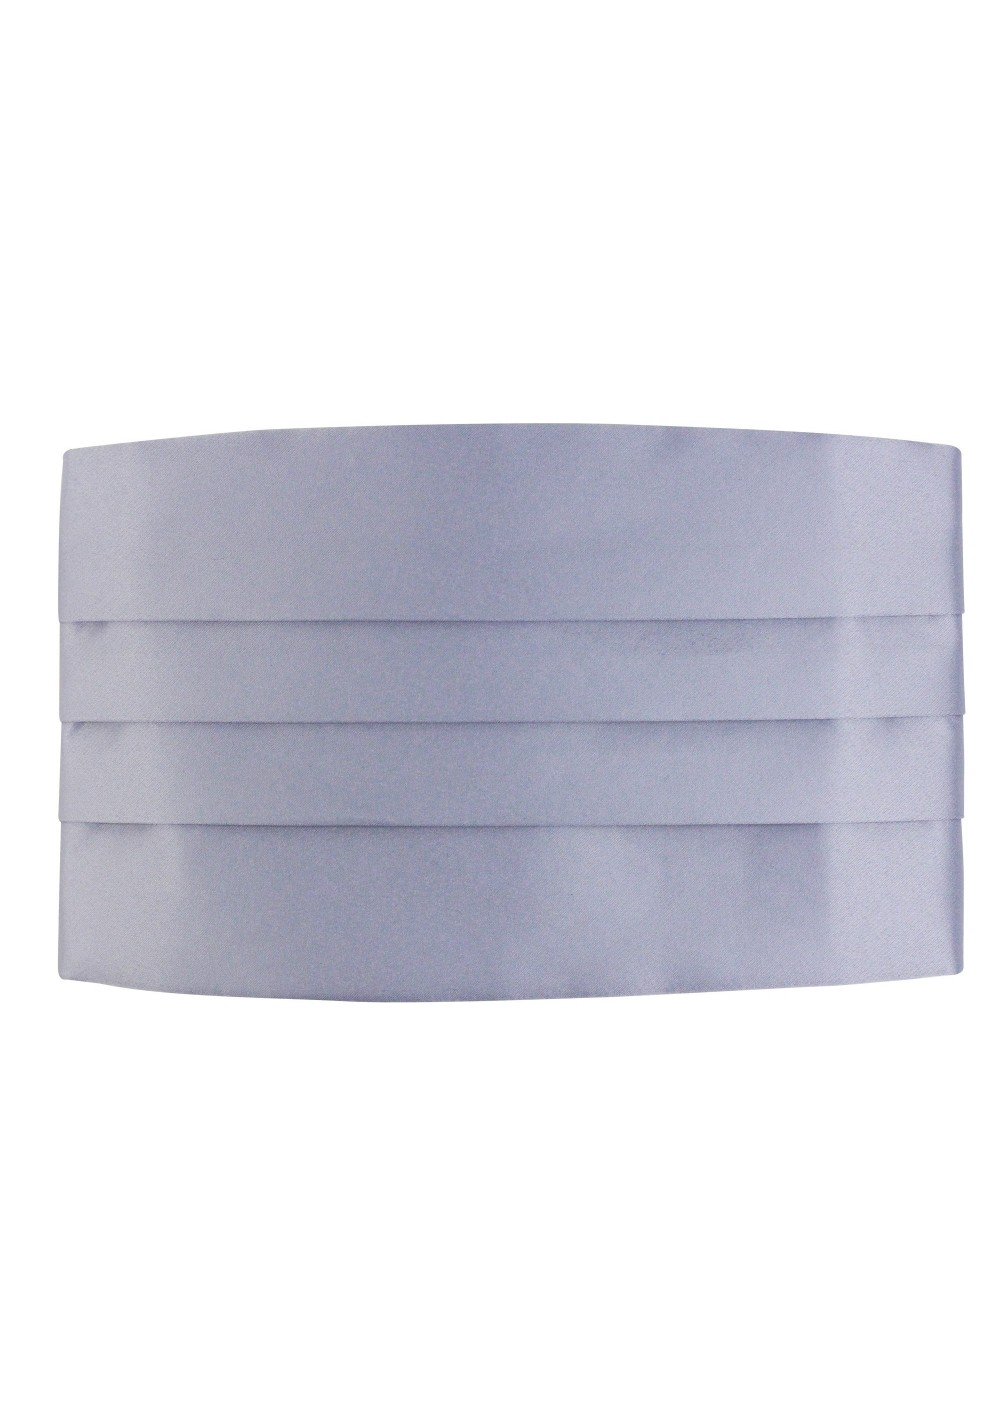 Silver Dress Cummerbund Front